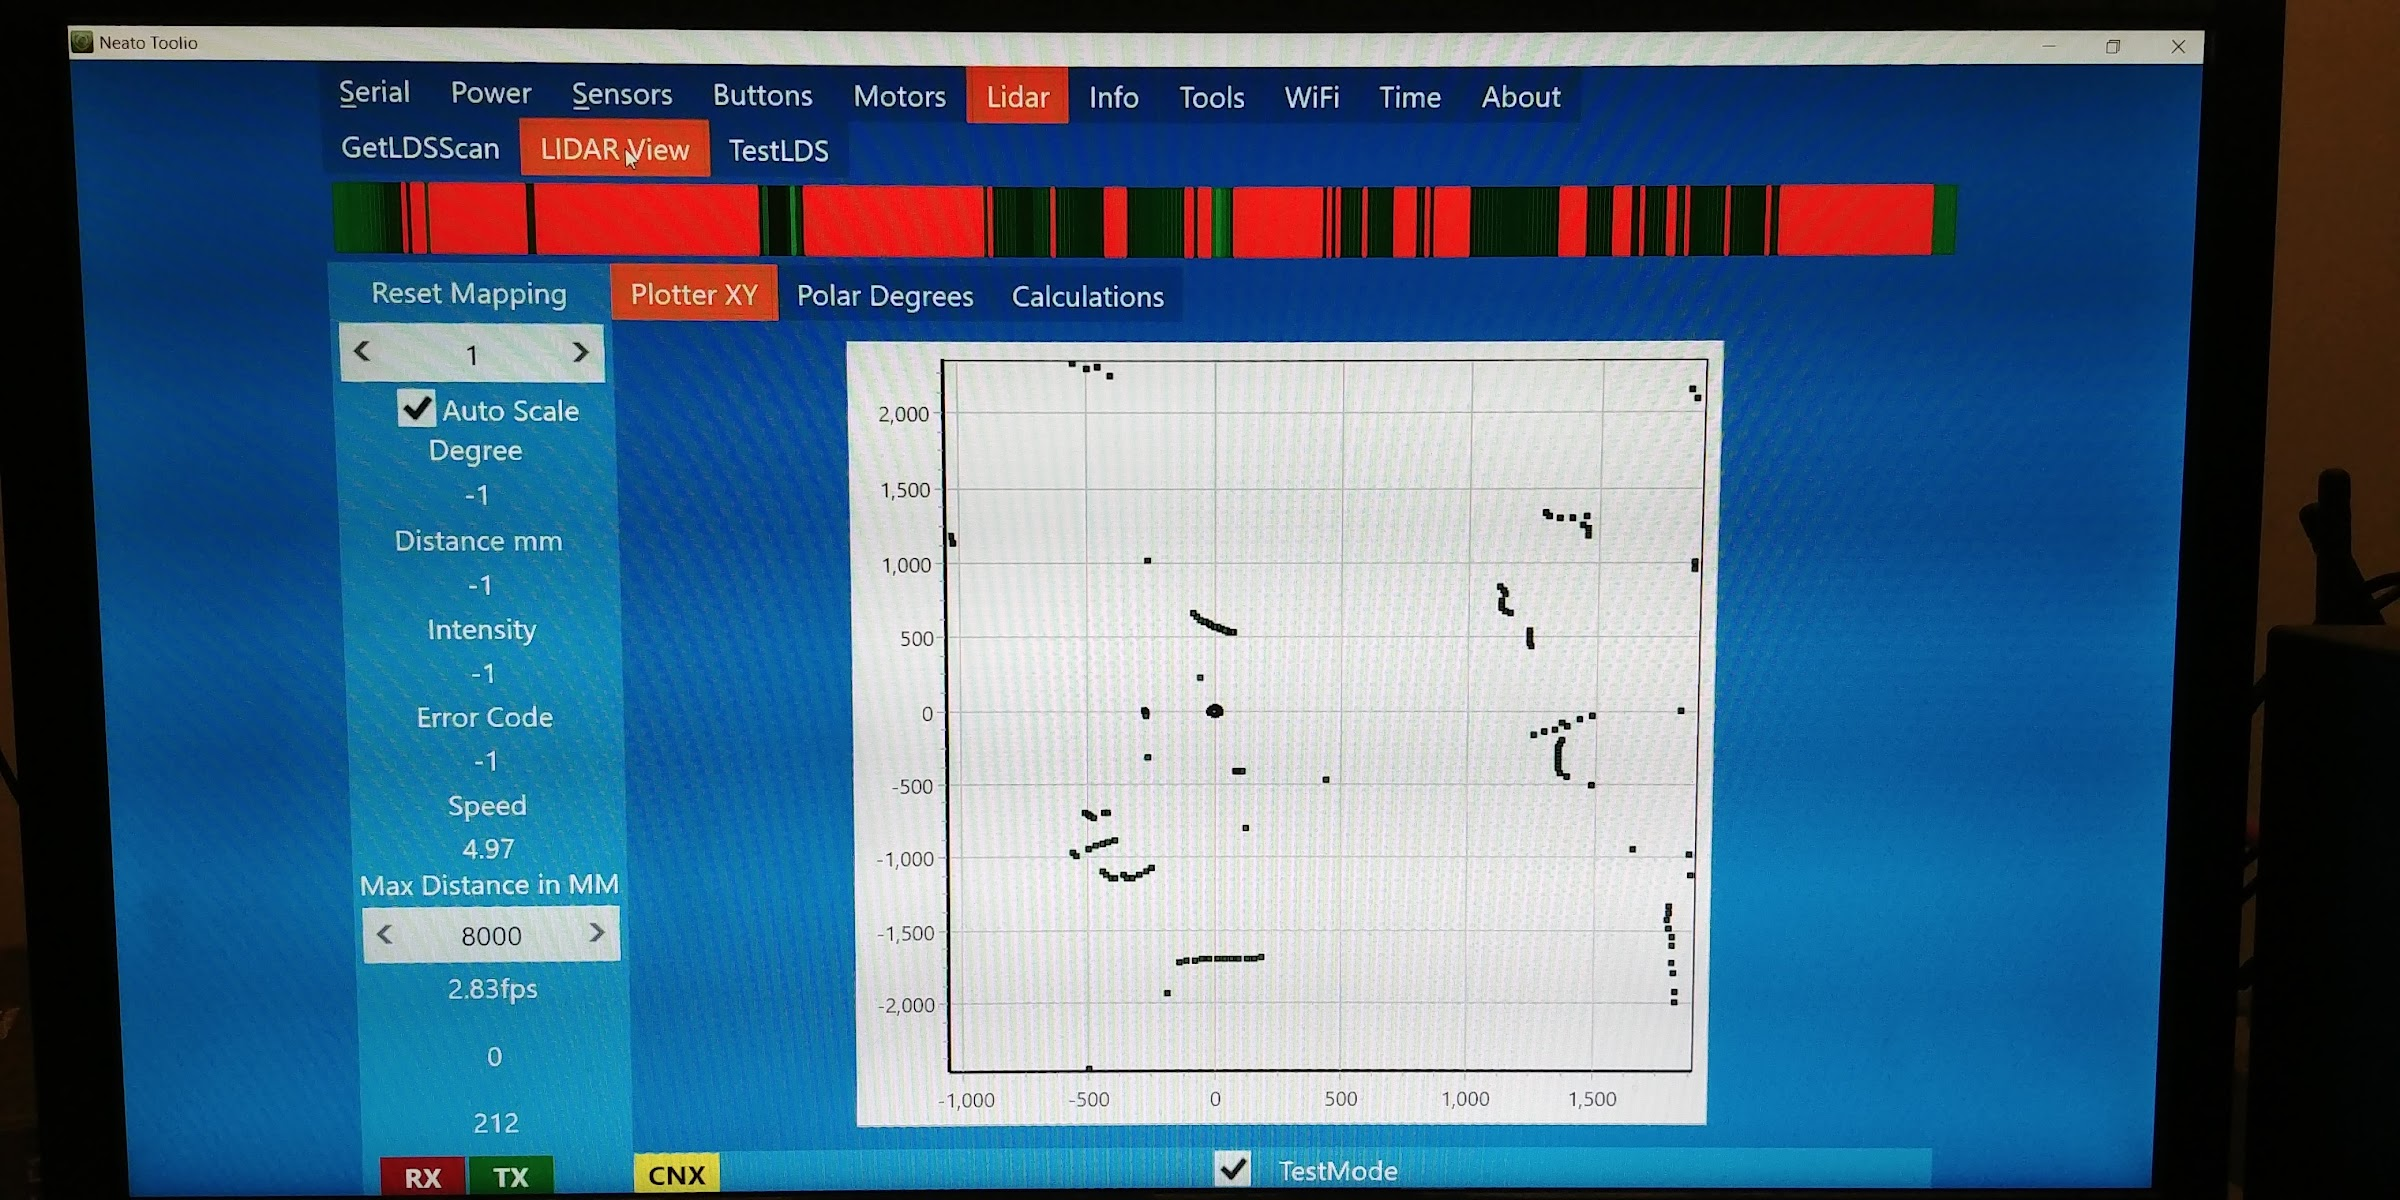 Neato Lidar scan